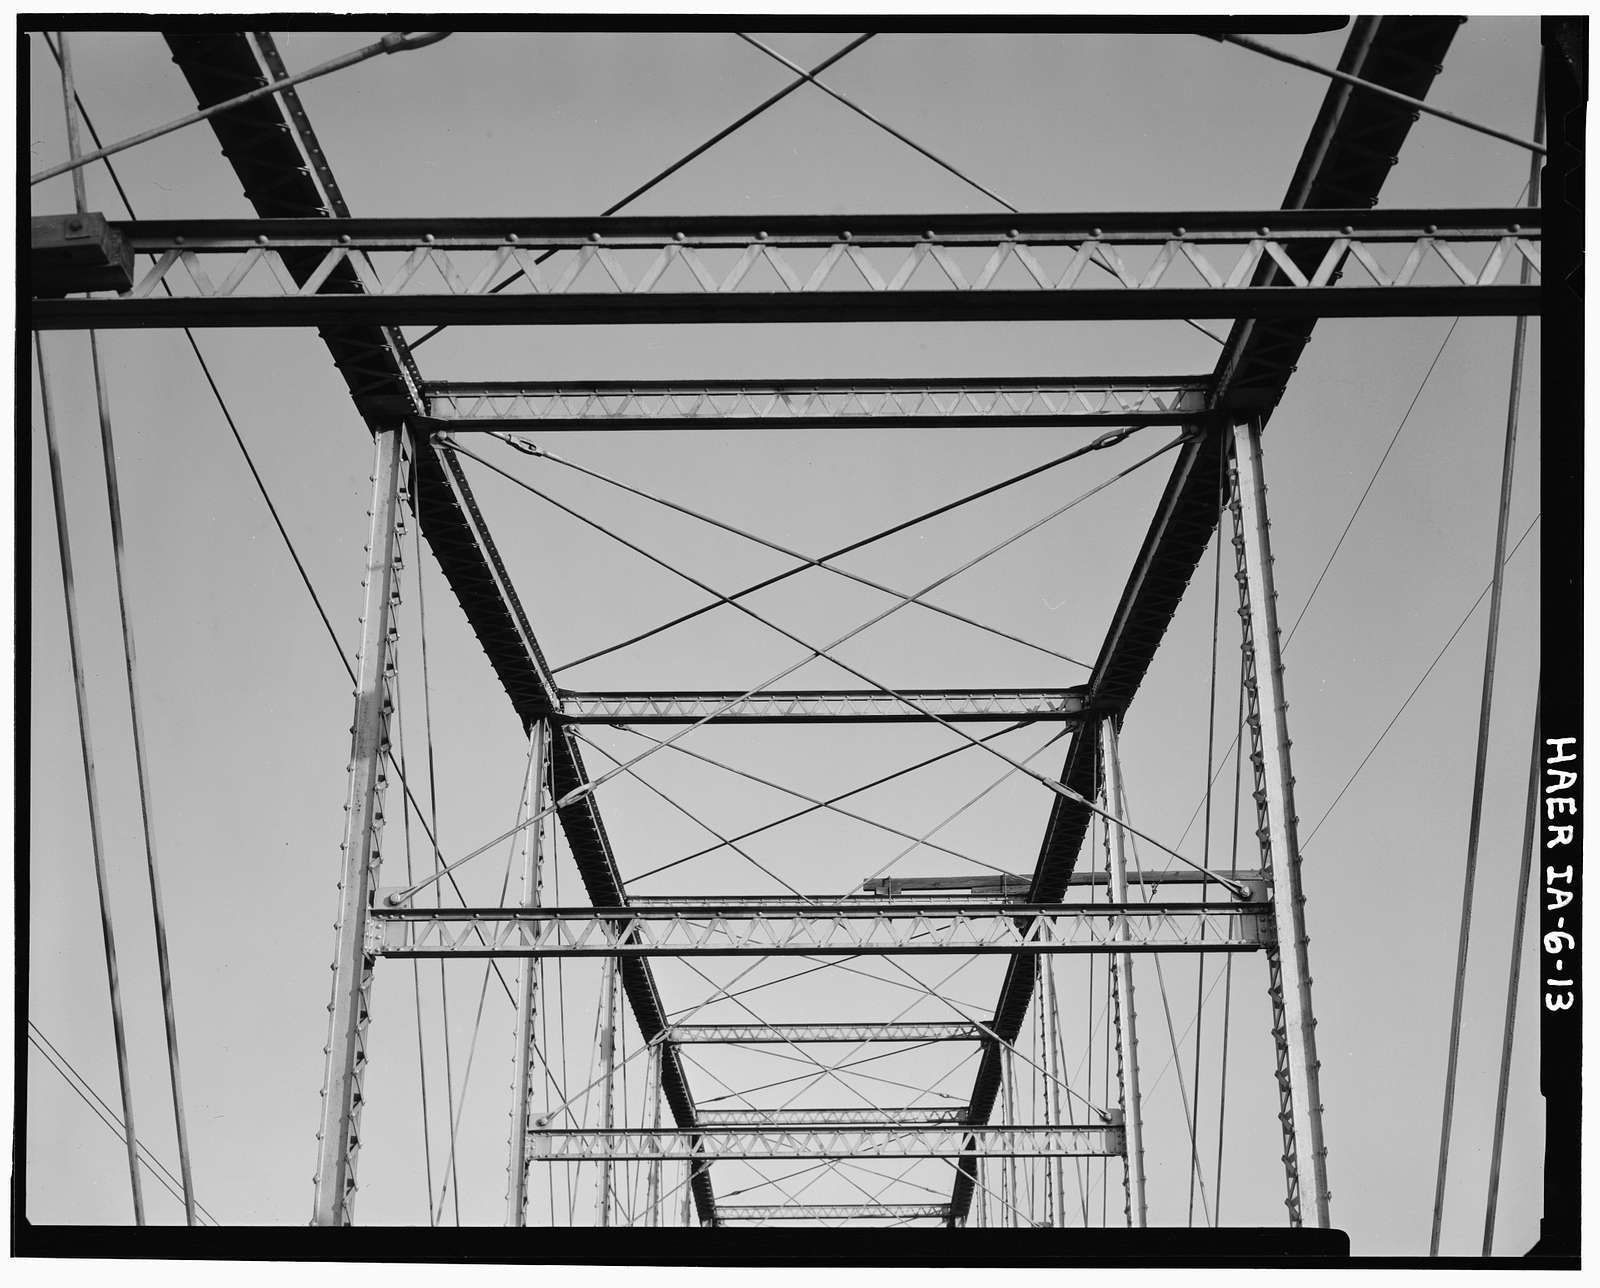 Sutliff's Ferry Bridge, Spanning Cedar River (Cedar Township), Solon, Johnson County, IA